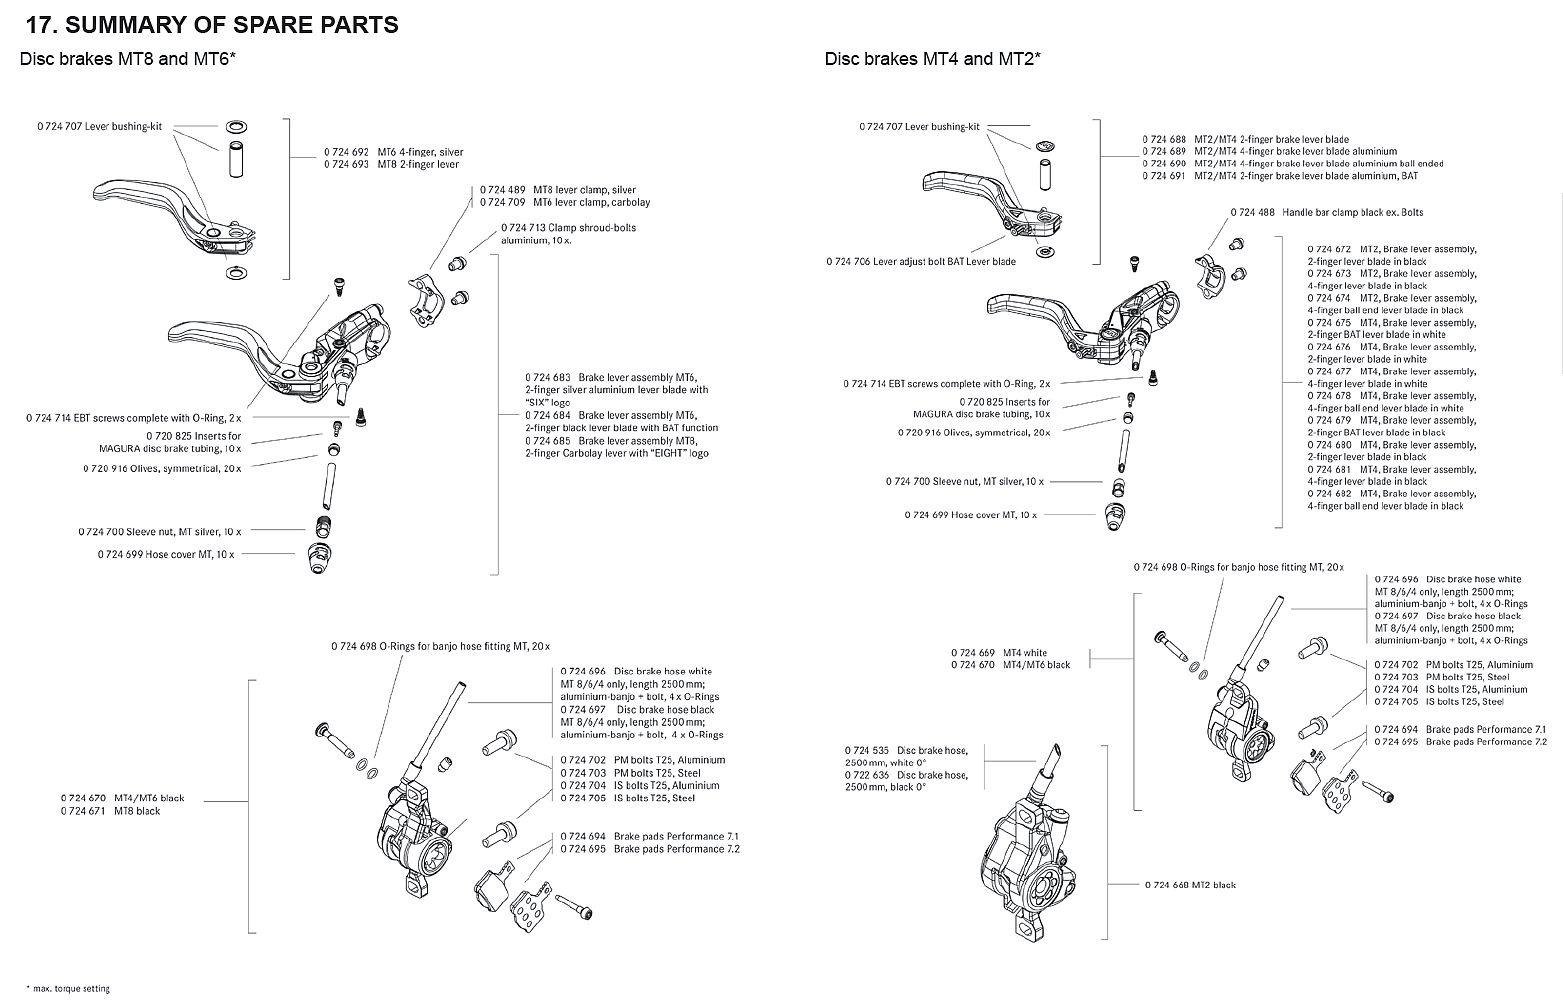 2012 Magura MT8, MT6, MT4, MT2 Spare Parts Diagram